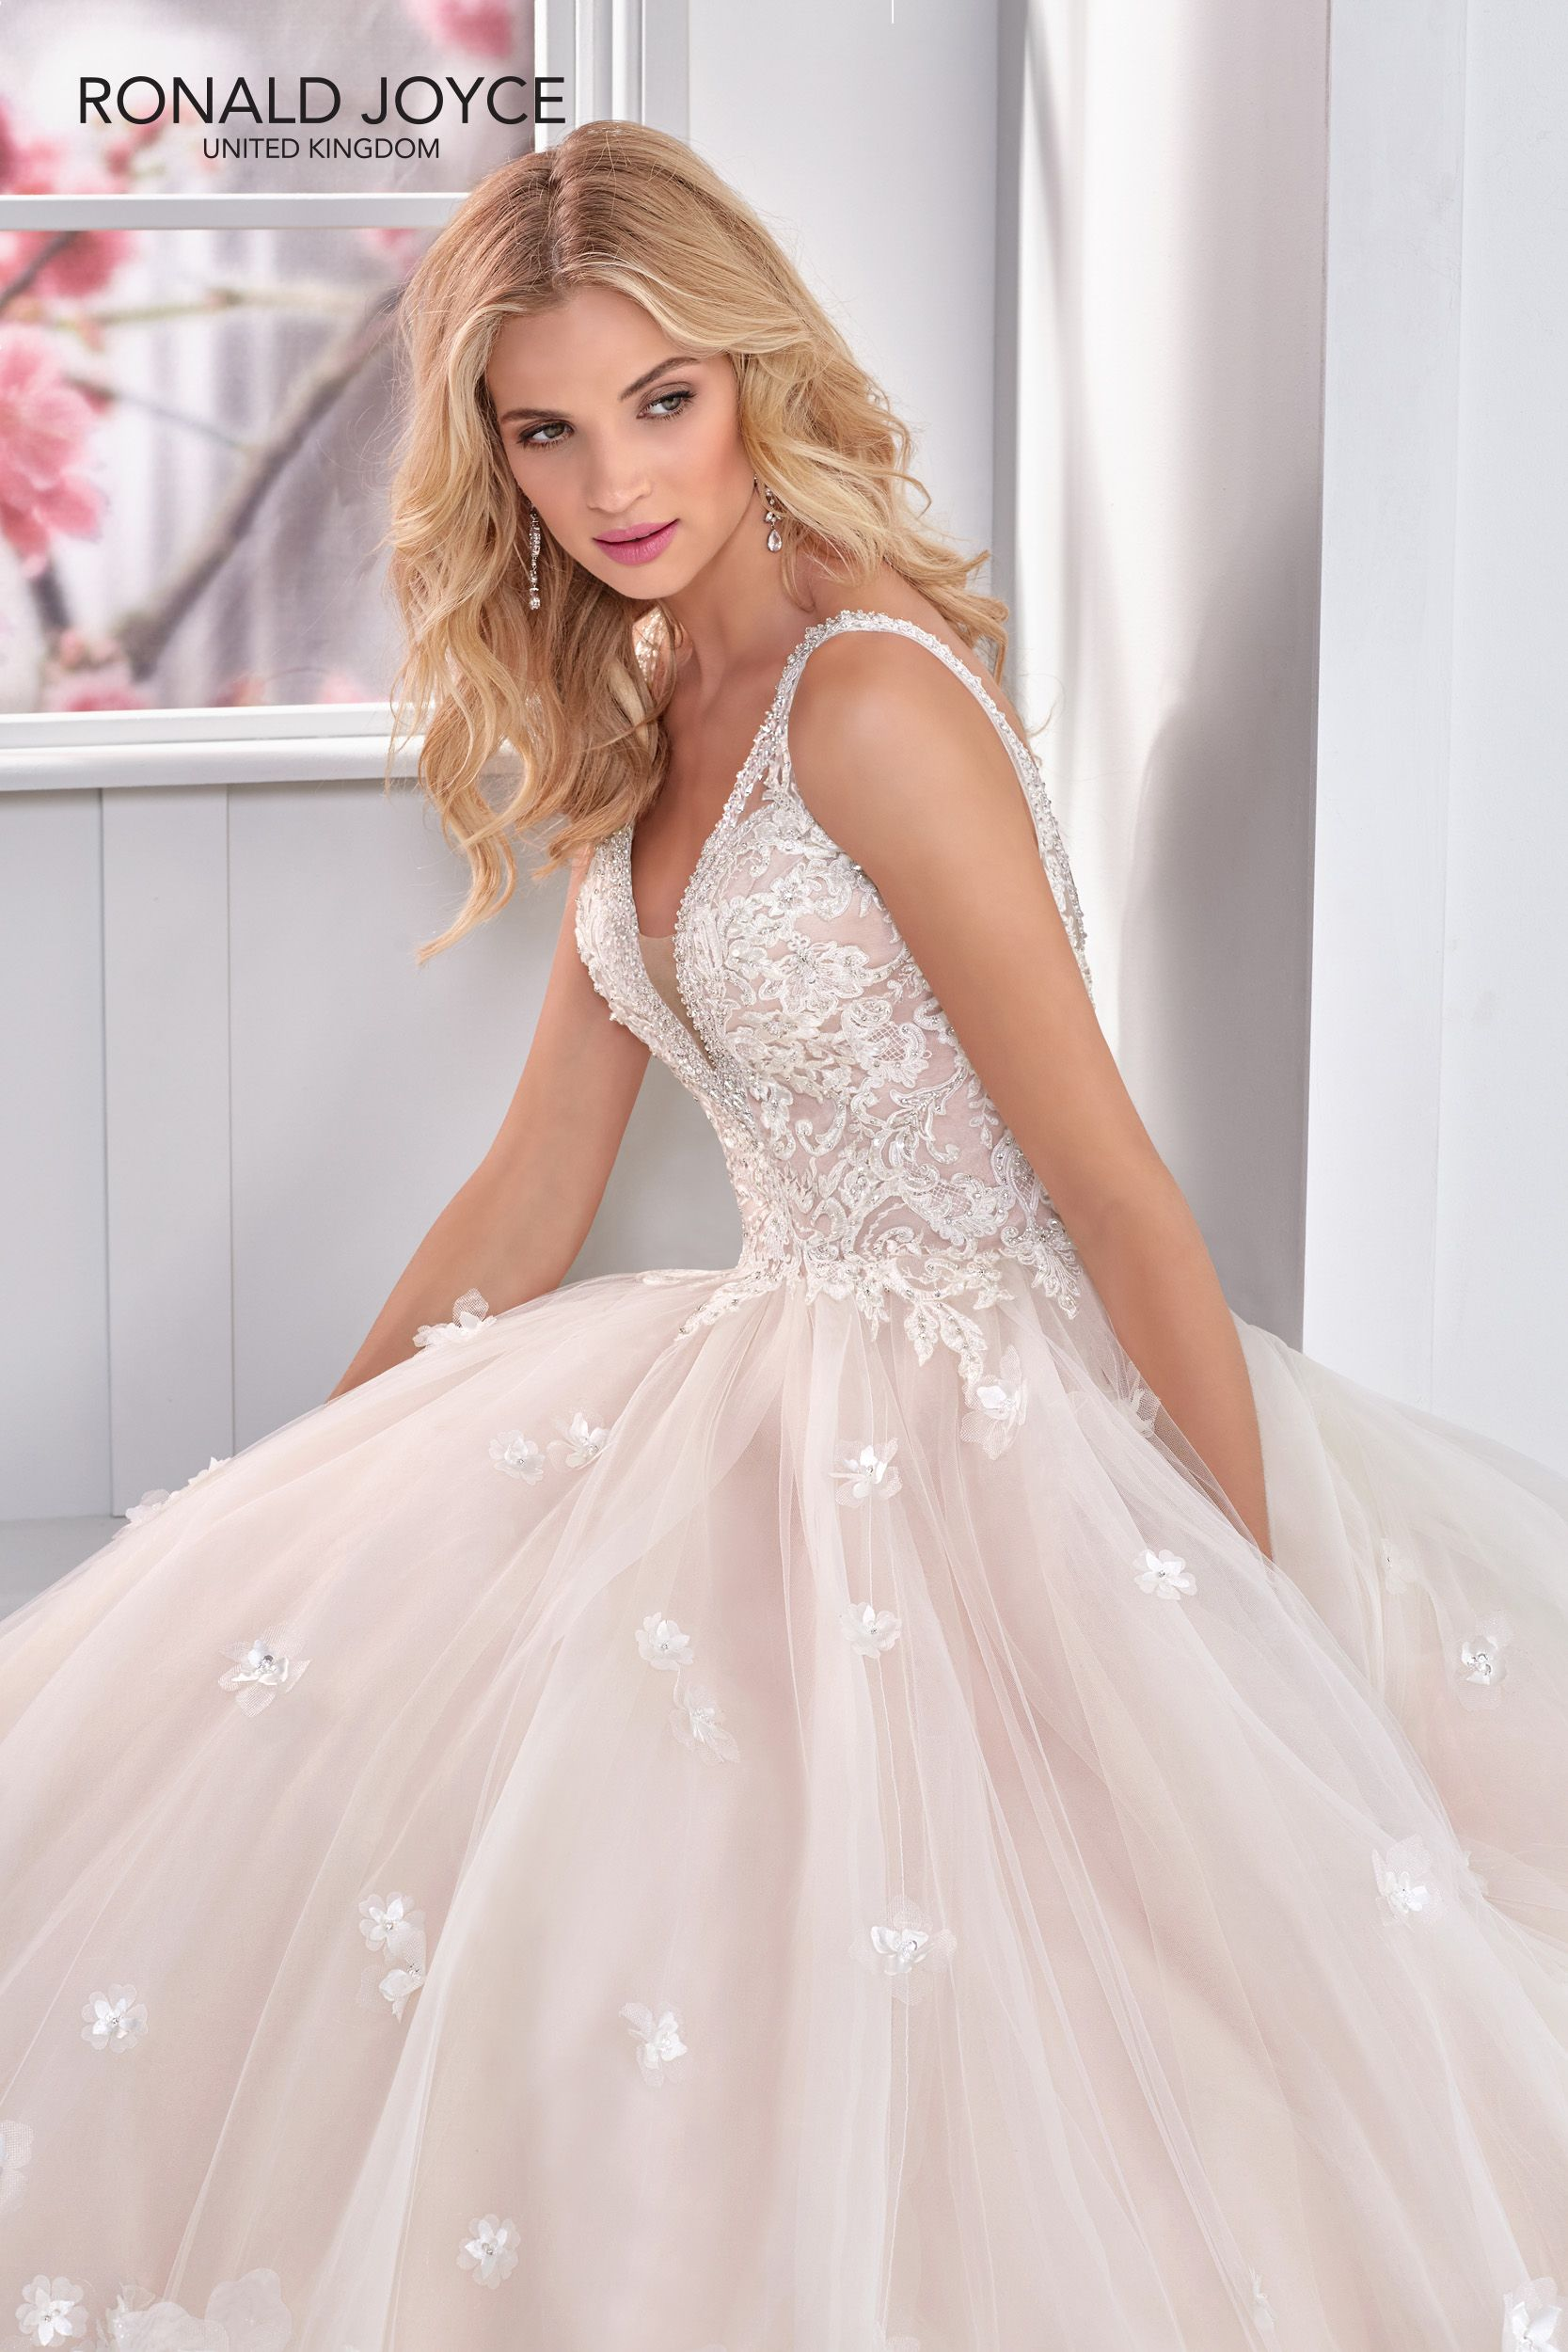 Modelo nora coleção ronald joyce jurken in